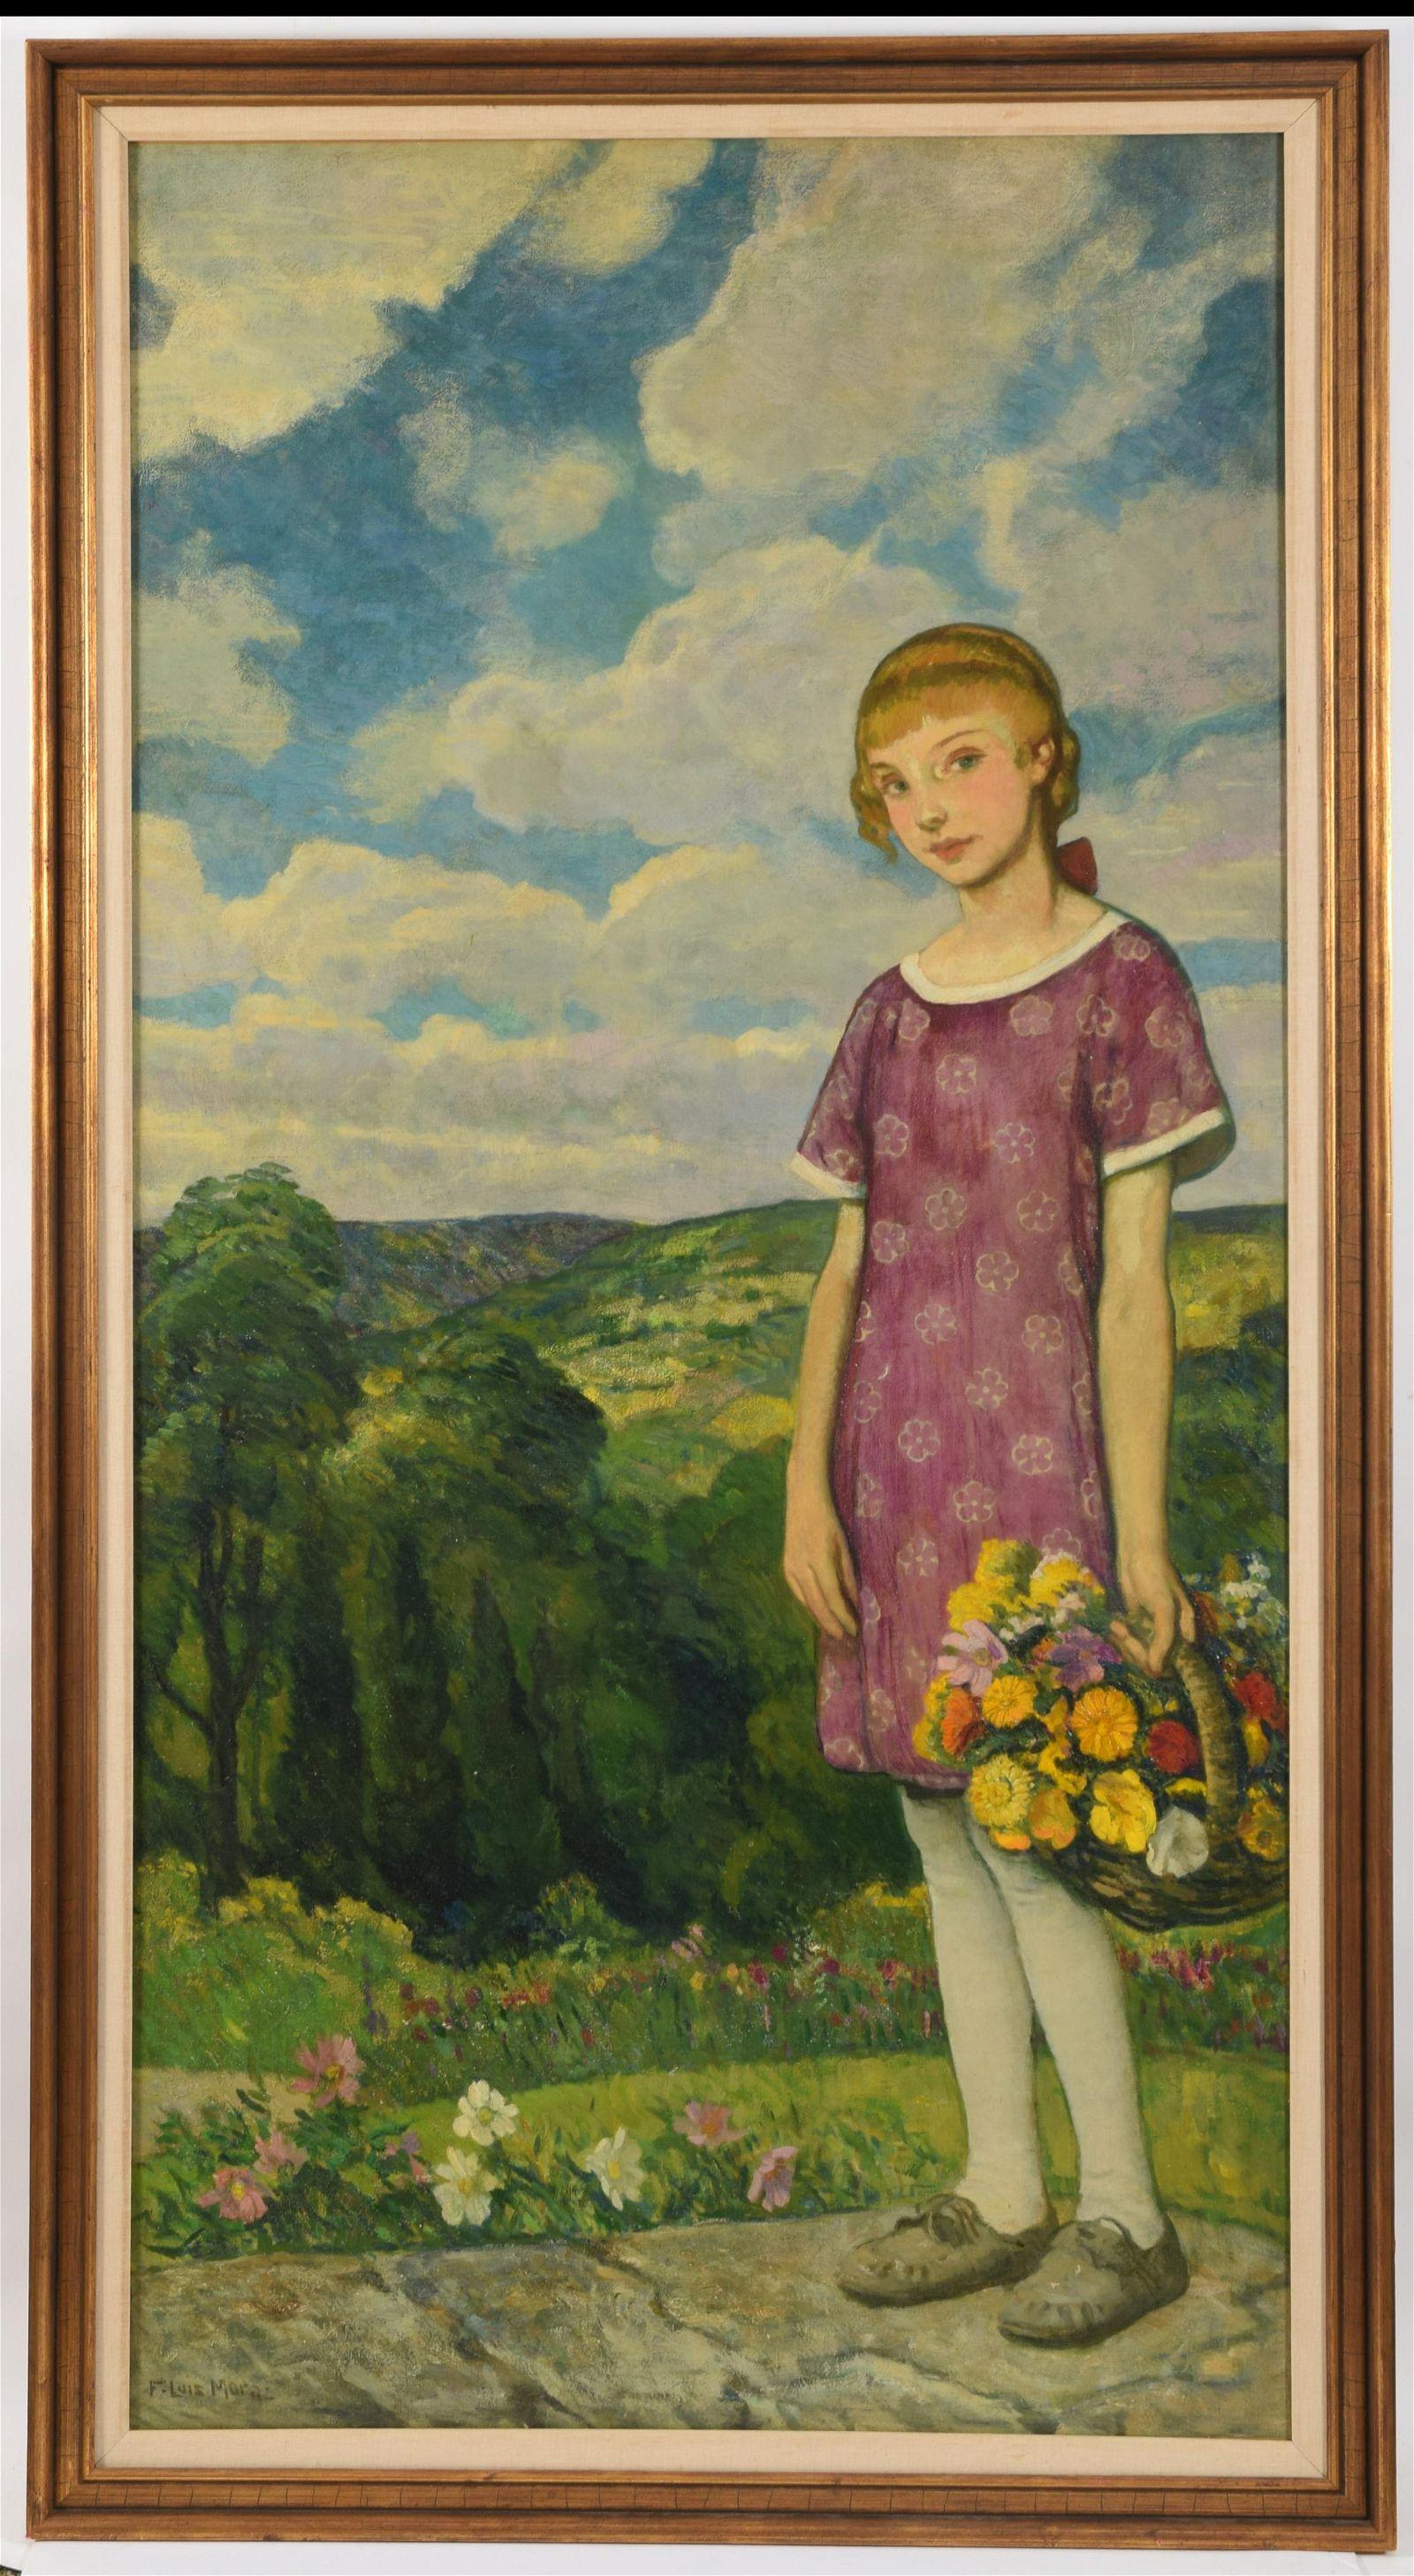 F. Louis Mora. American. Large lifesize painting